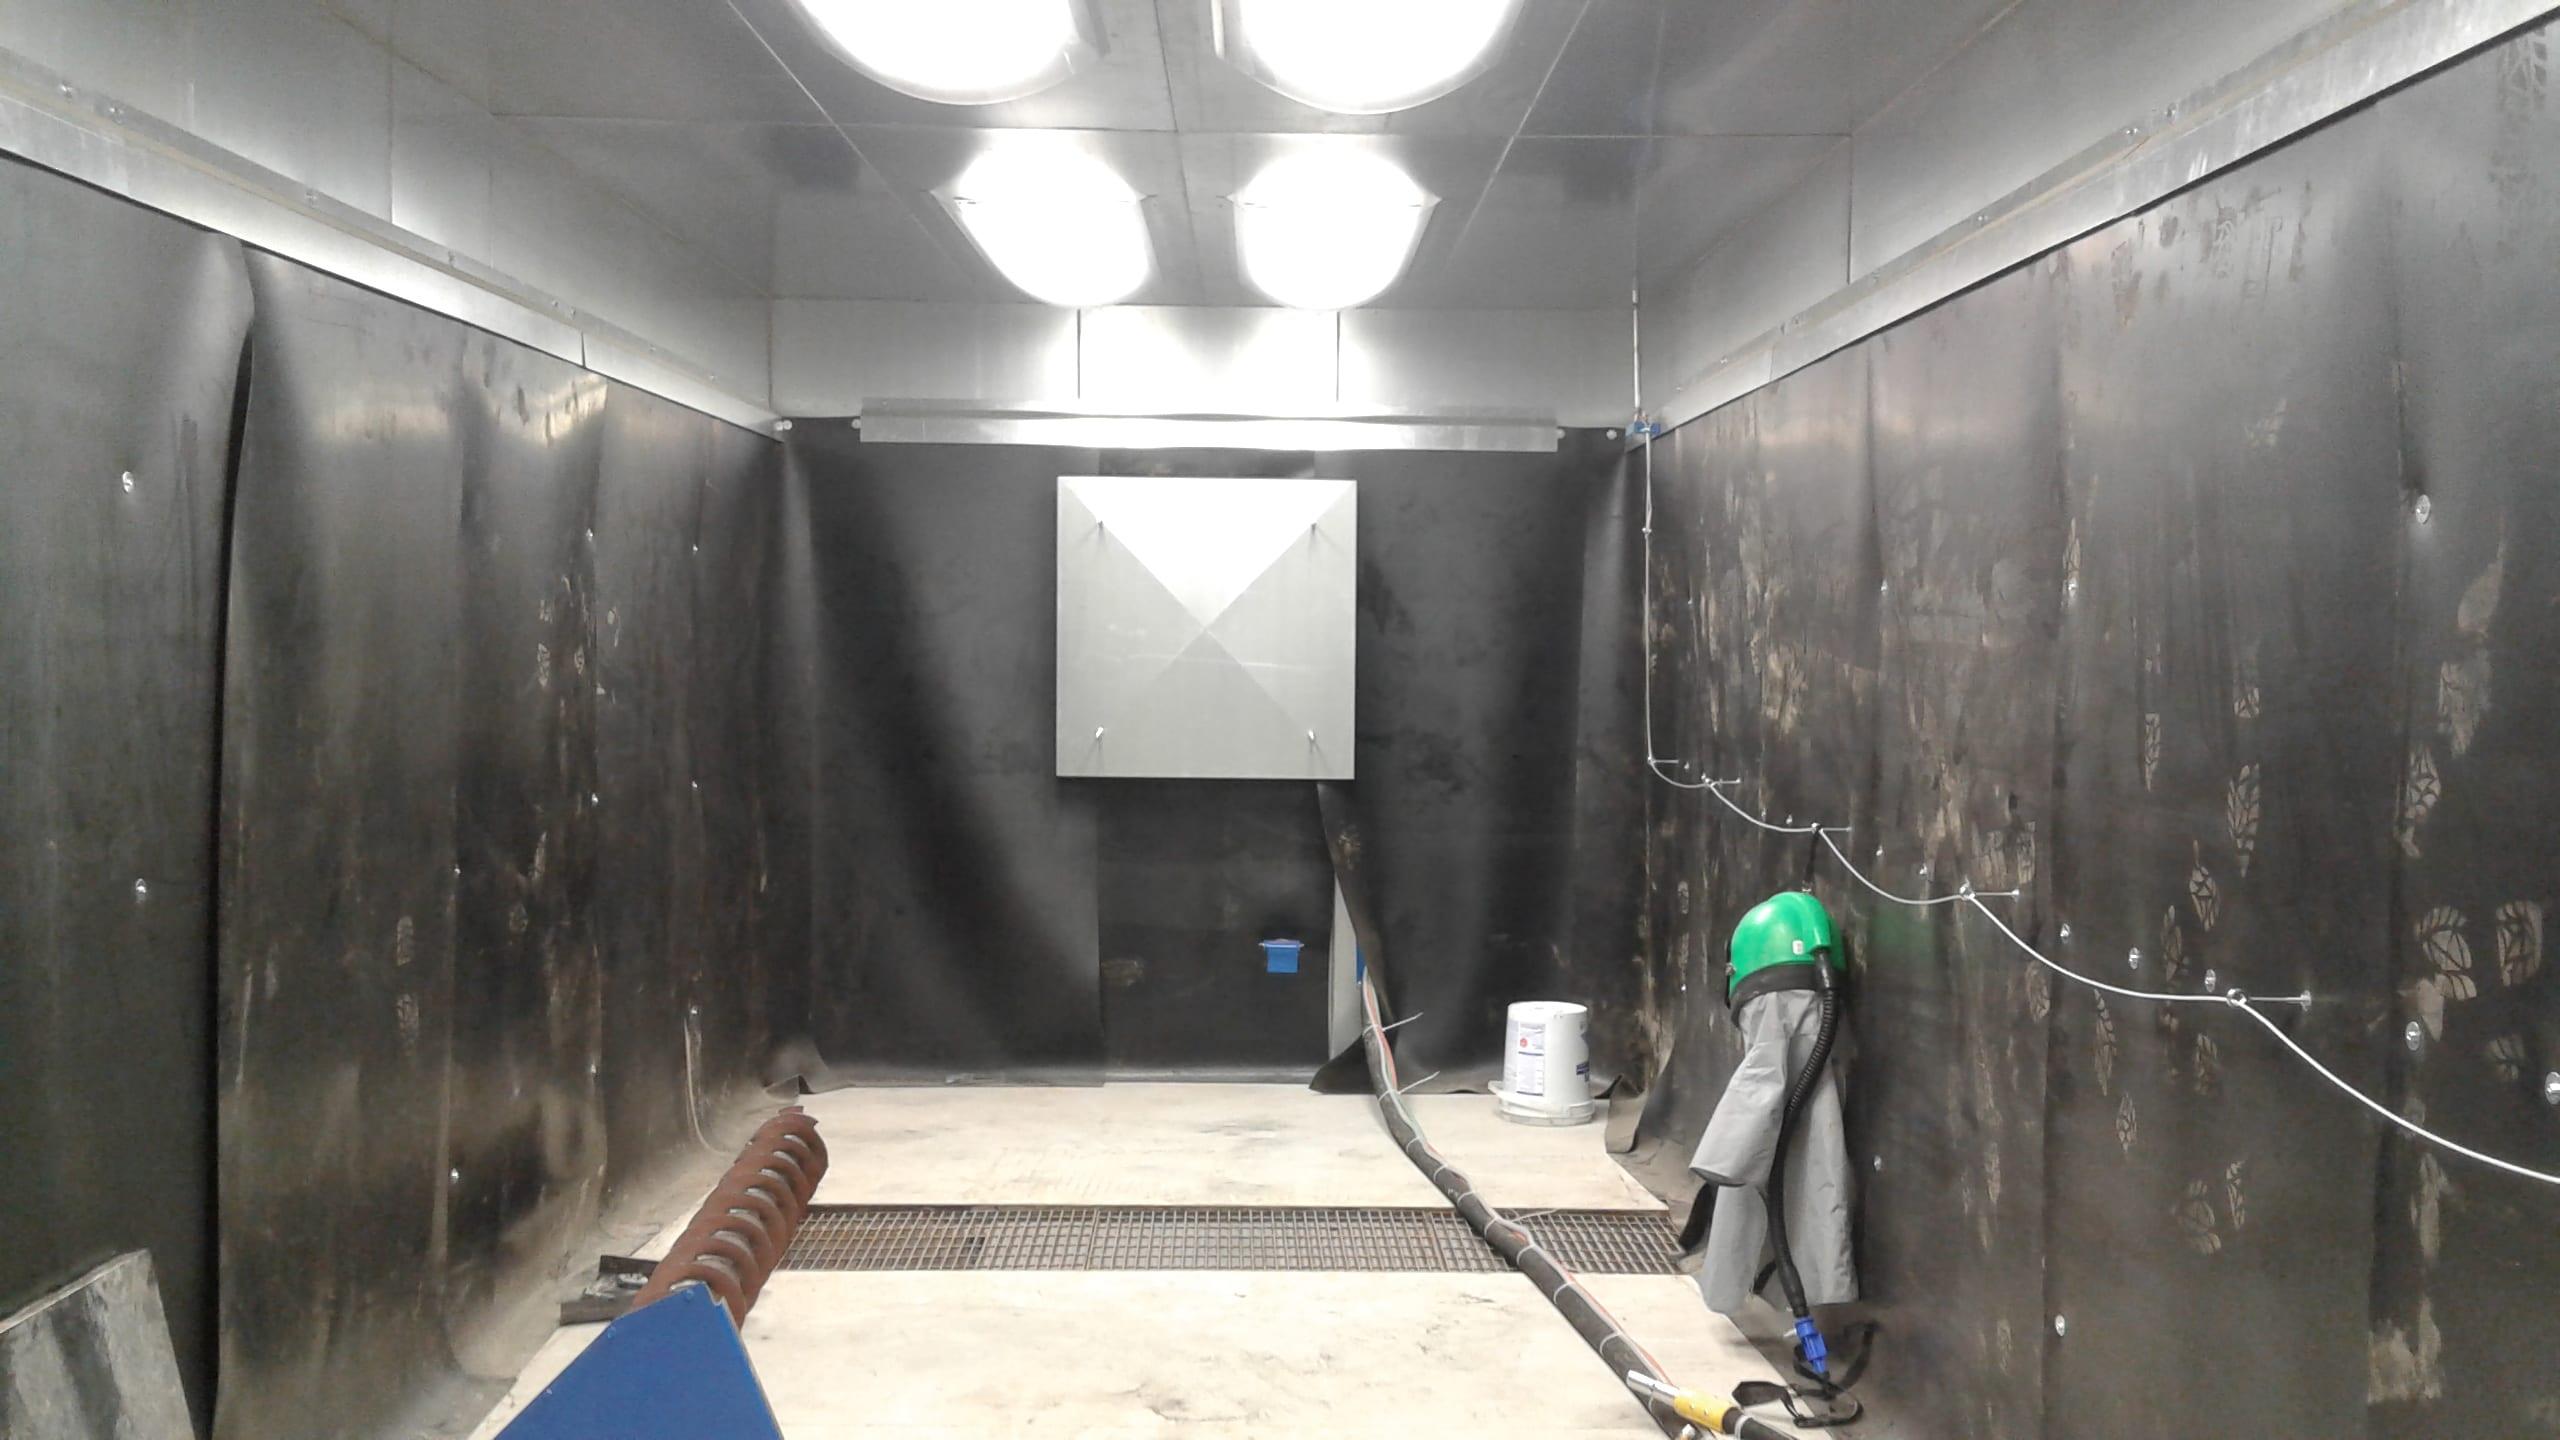 Sandblast Booth Air Outlet Plenum